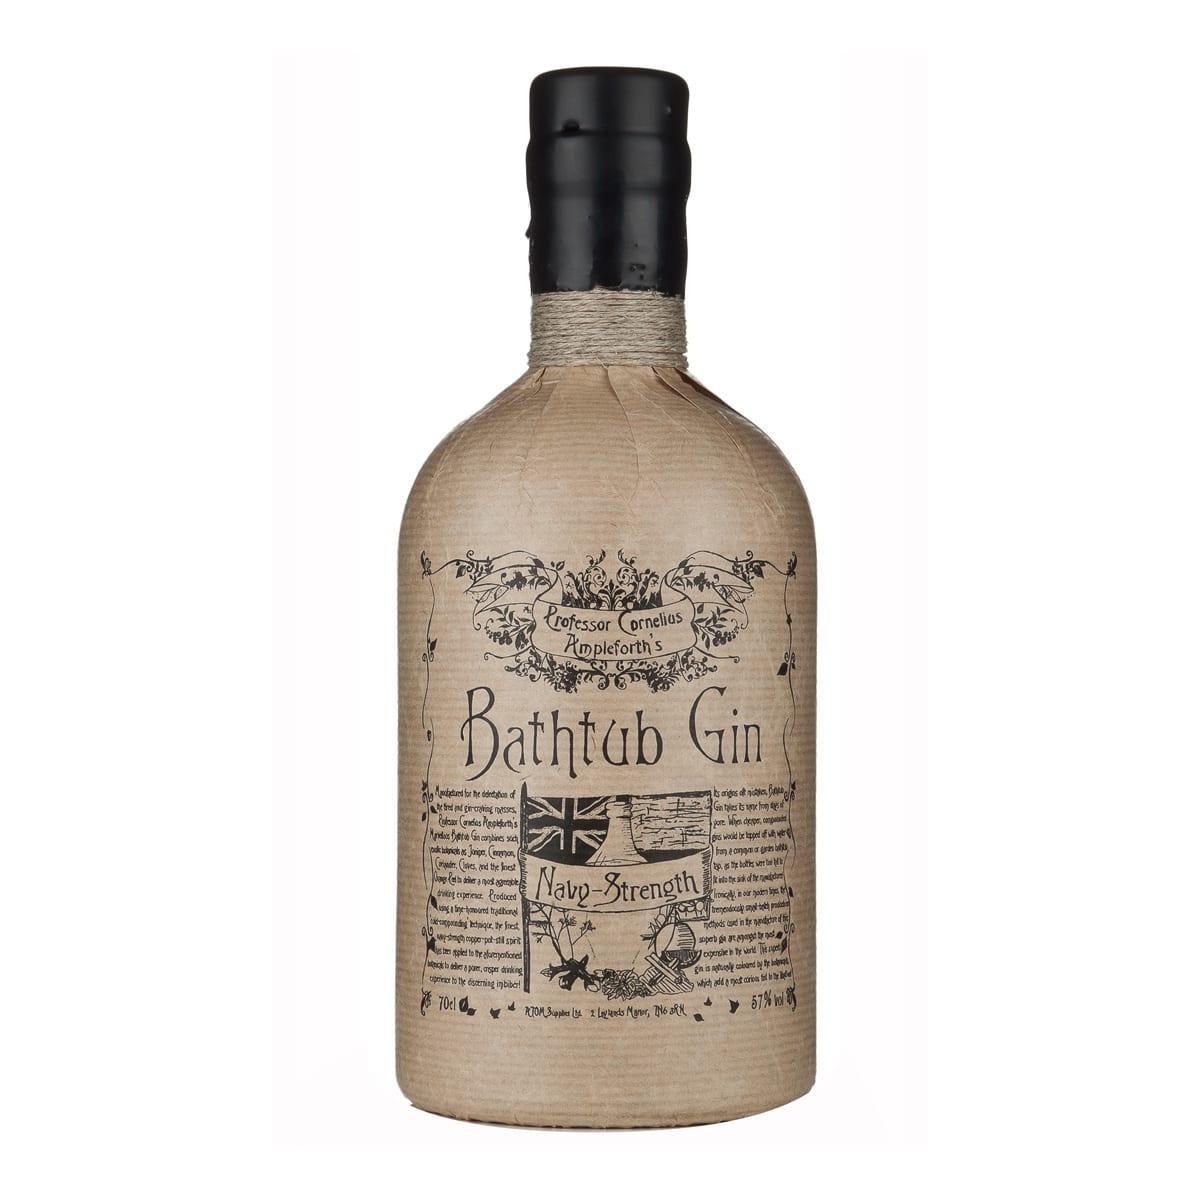 Bathtub Gin – Navy-Strength